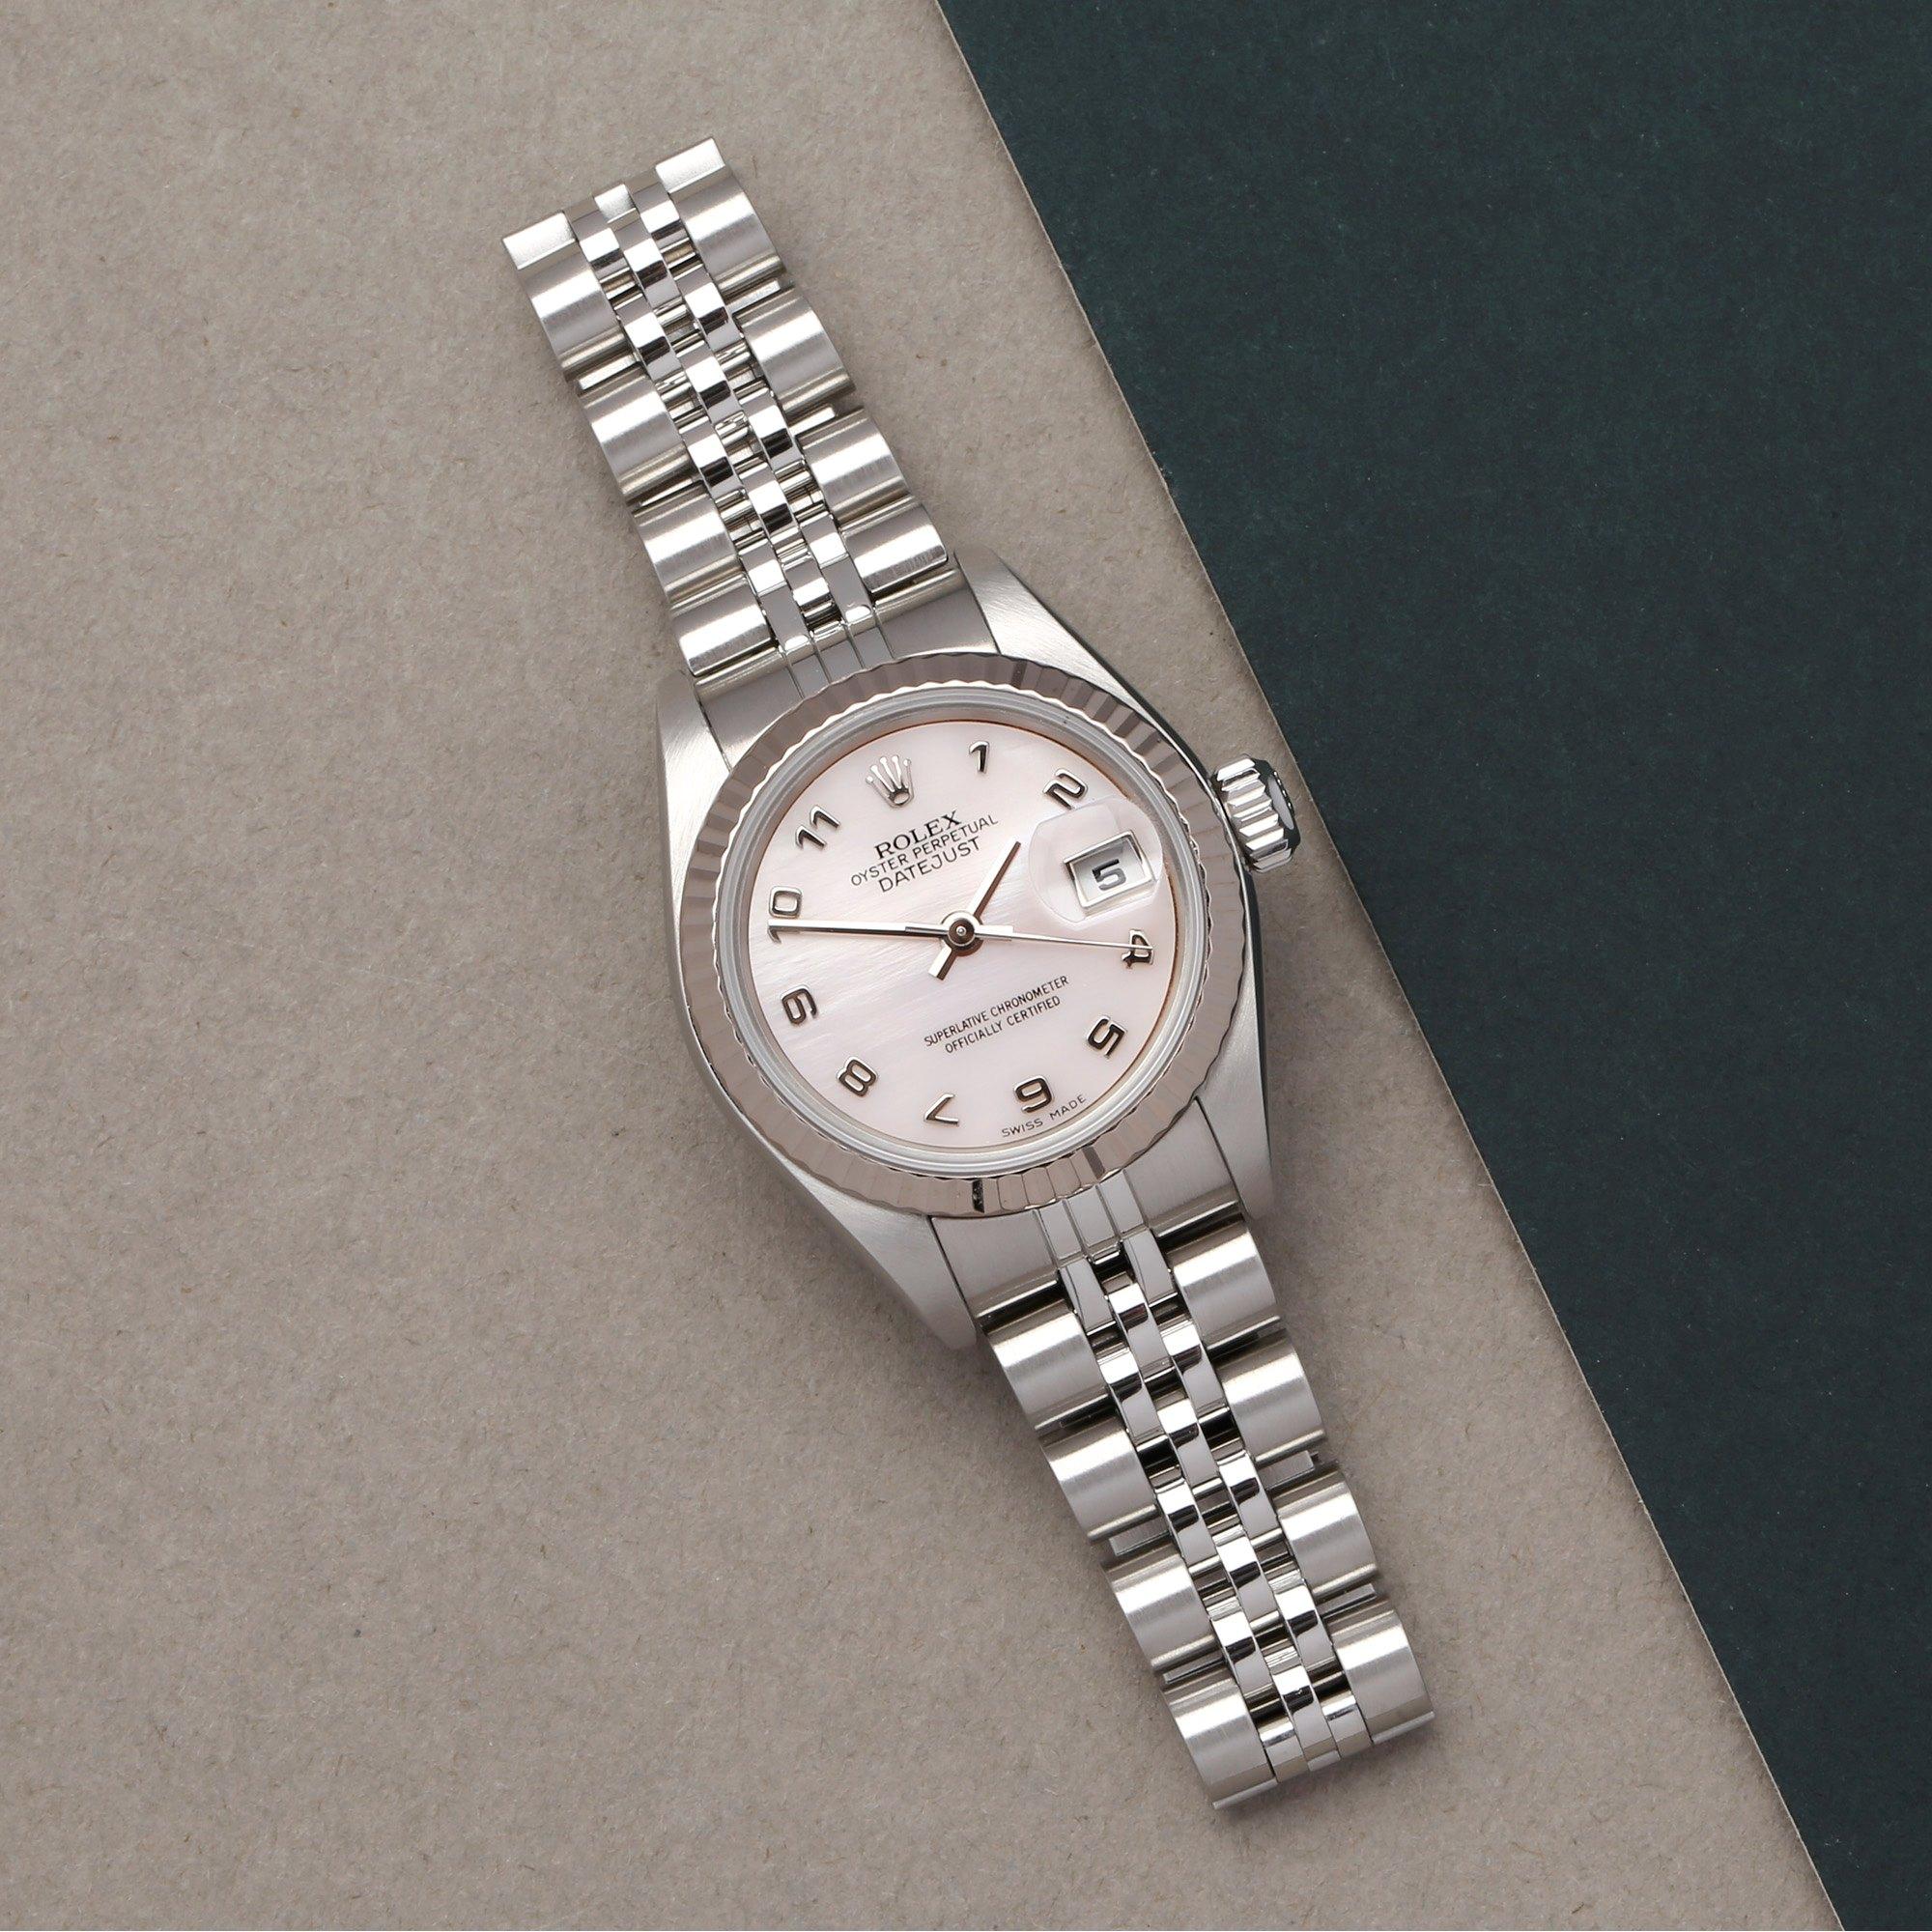 Rolex Datejust 26 Stainless Steel 79174NR